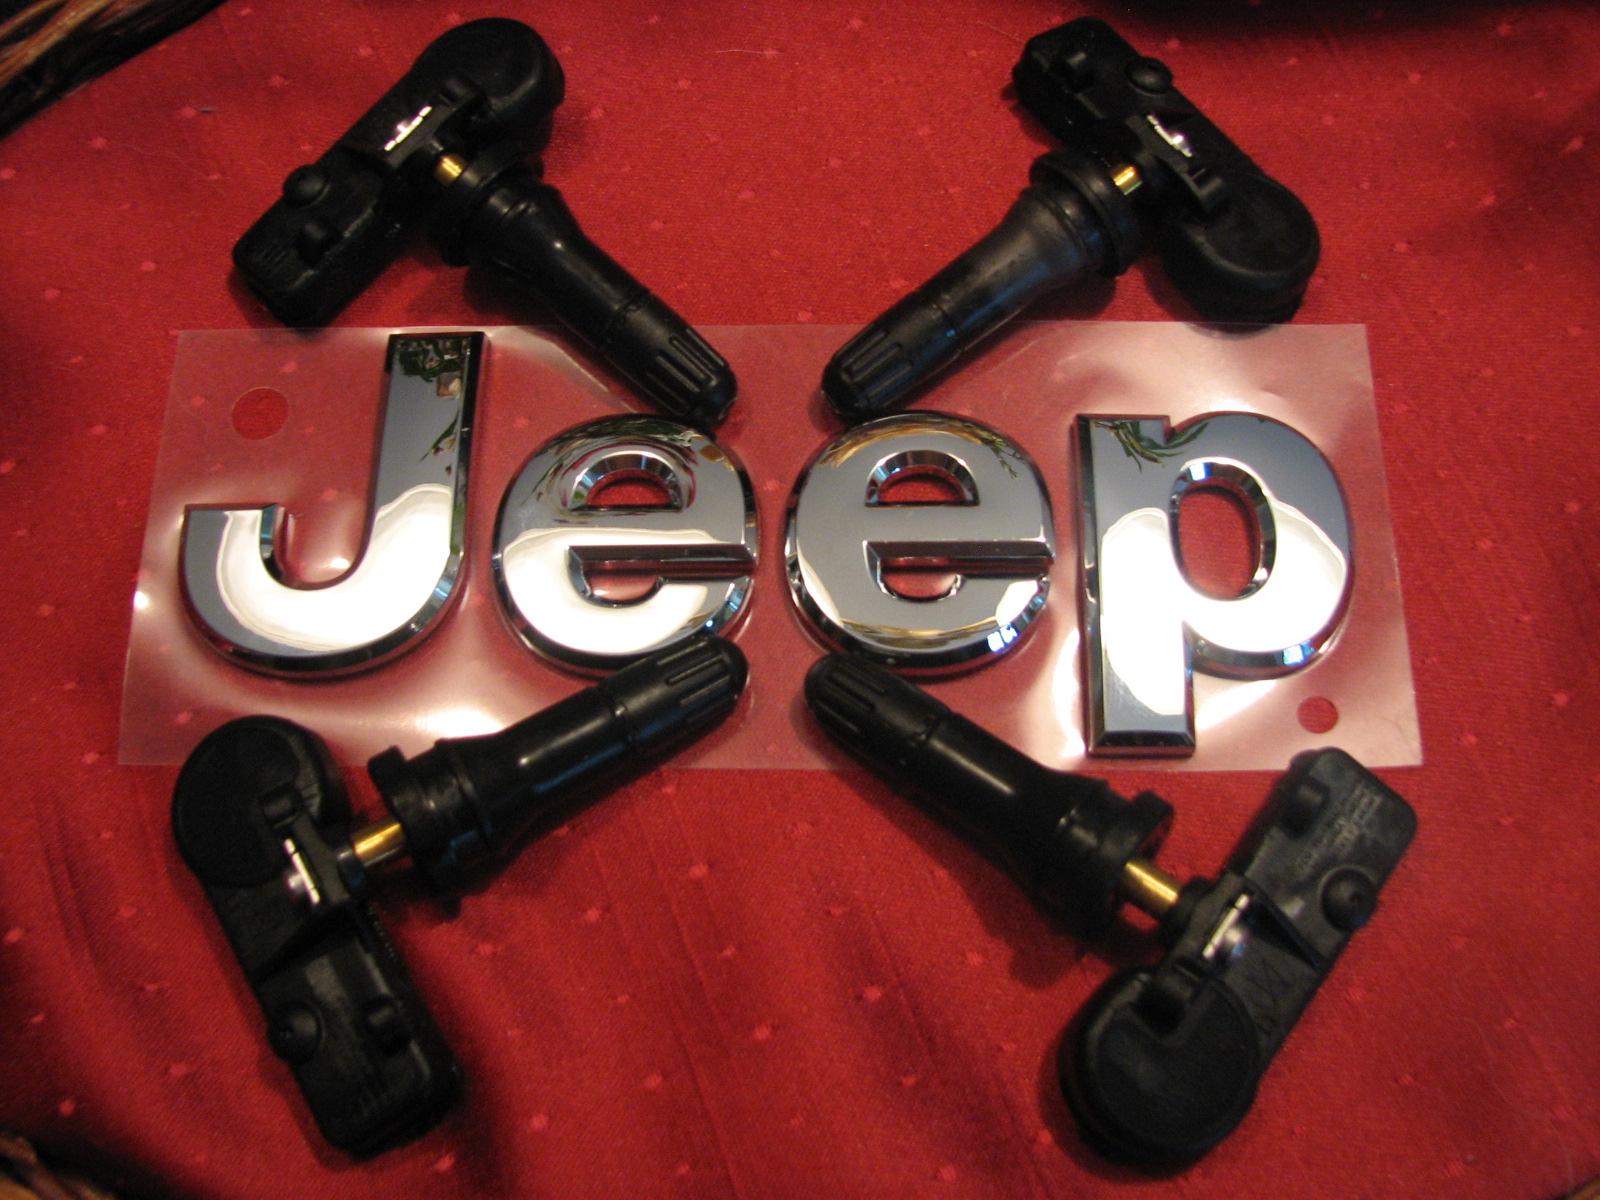 Jeep TPMS Tire Sensors Set of 5 2013 Wrangler 56029398 AB Brand New FedEx